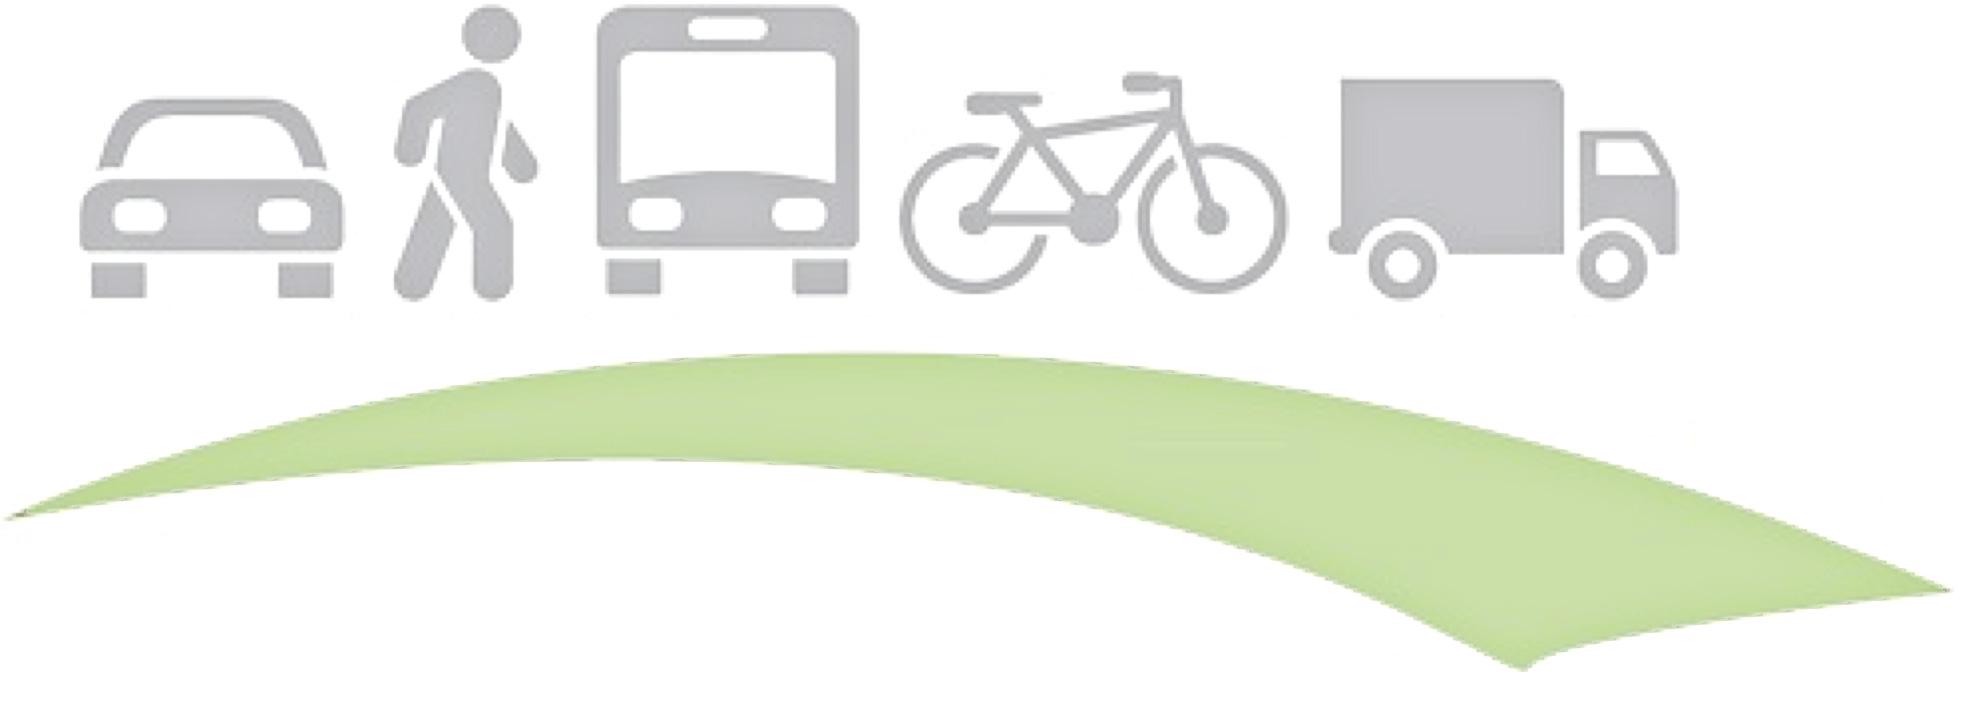 fivco-transportation-1